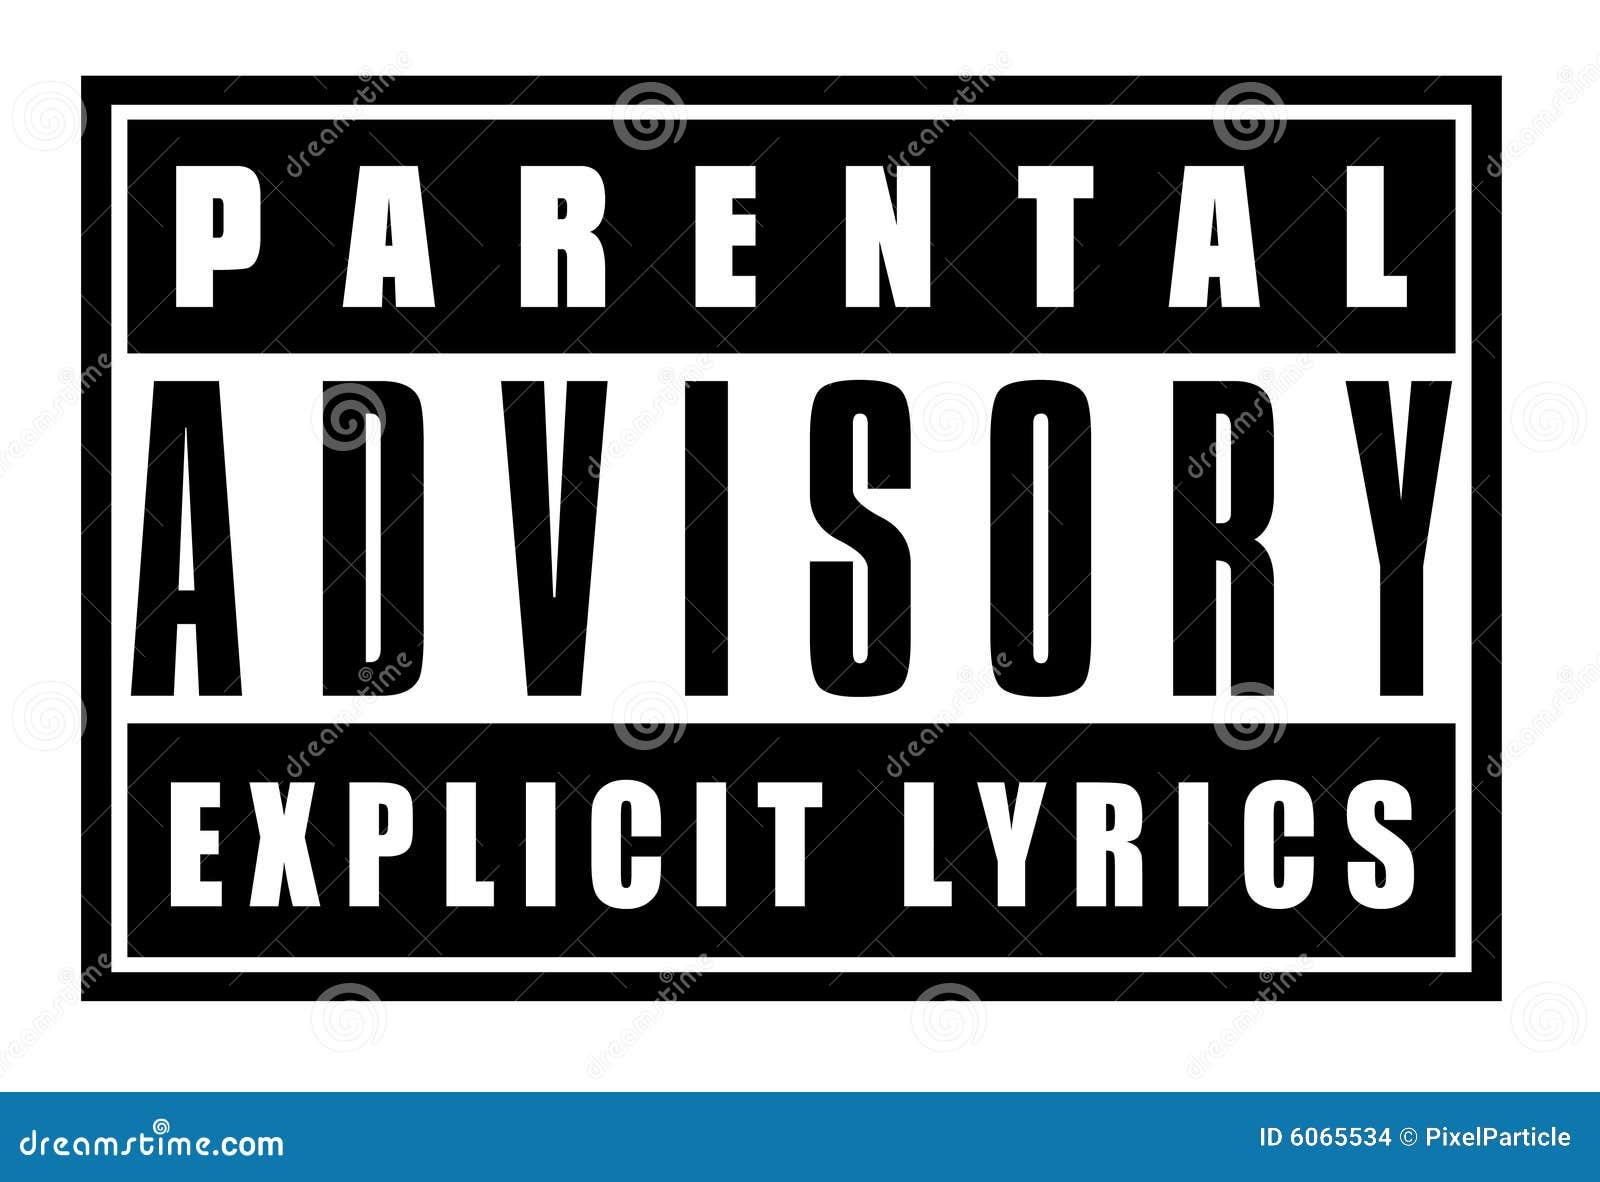 parental advisory explicit lyrcs sign stock illustration